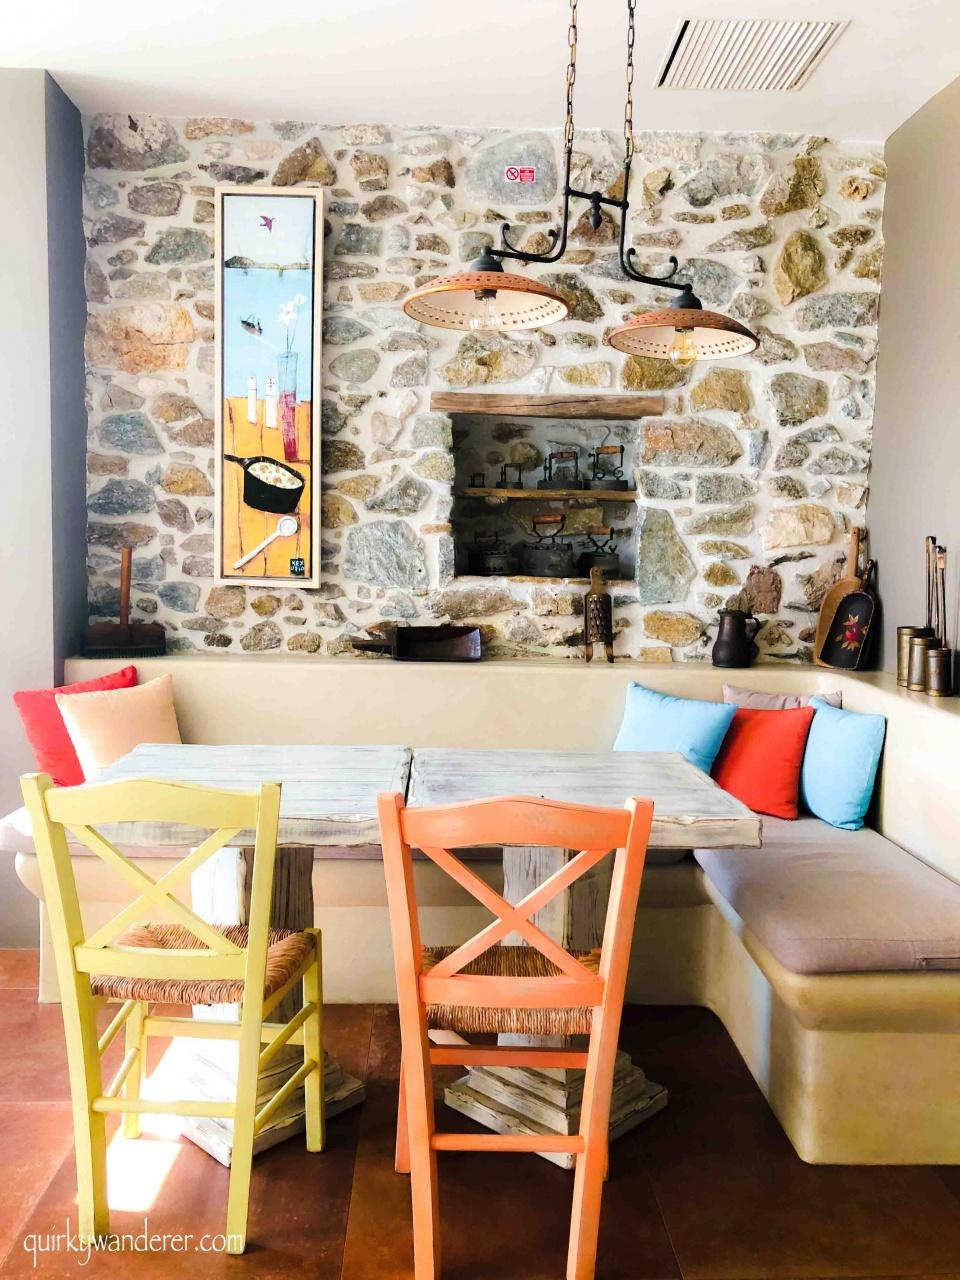 vegetarian food in Naxos